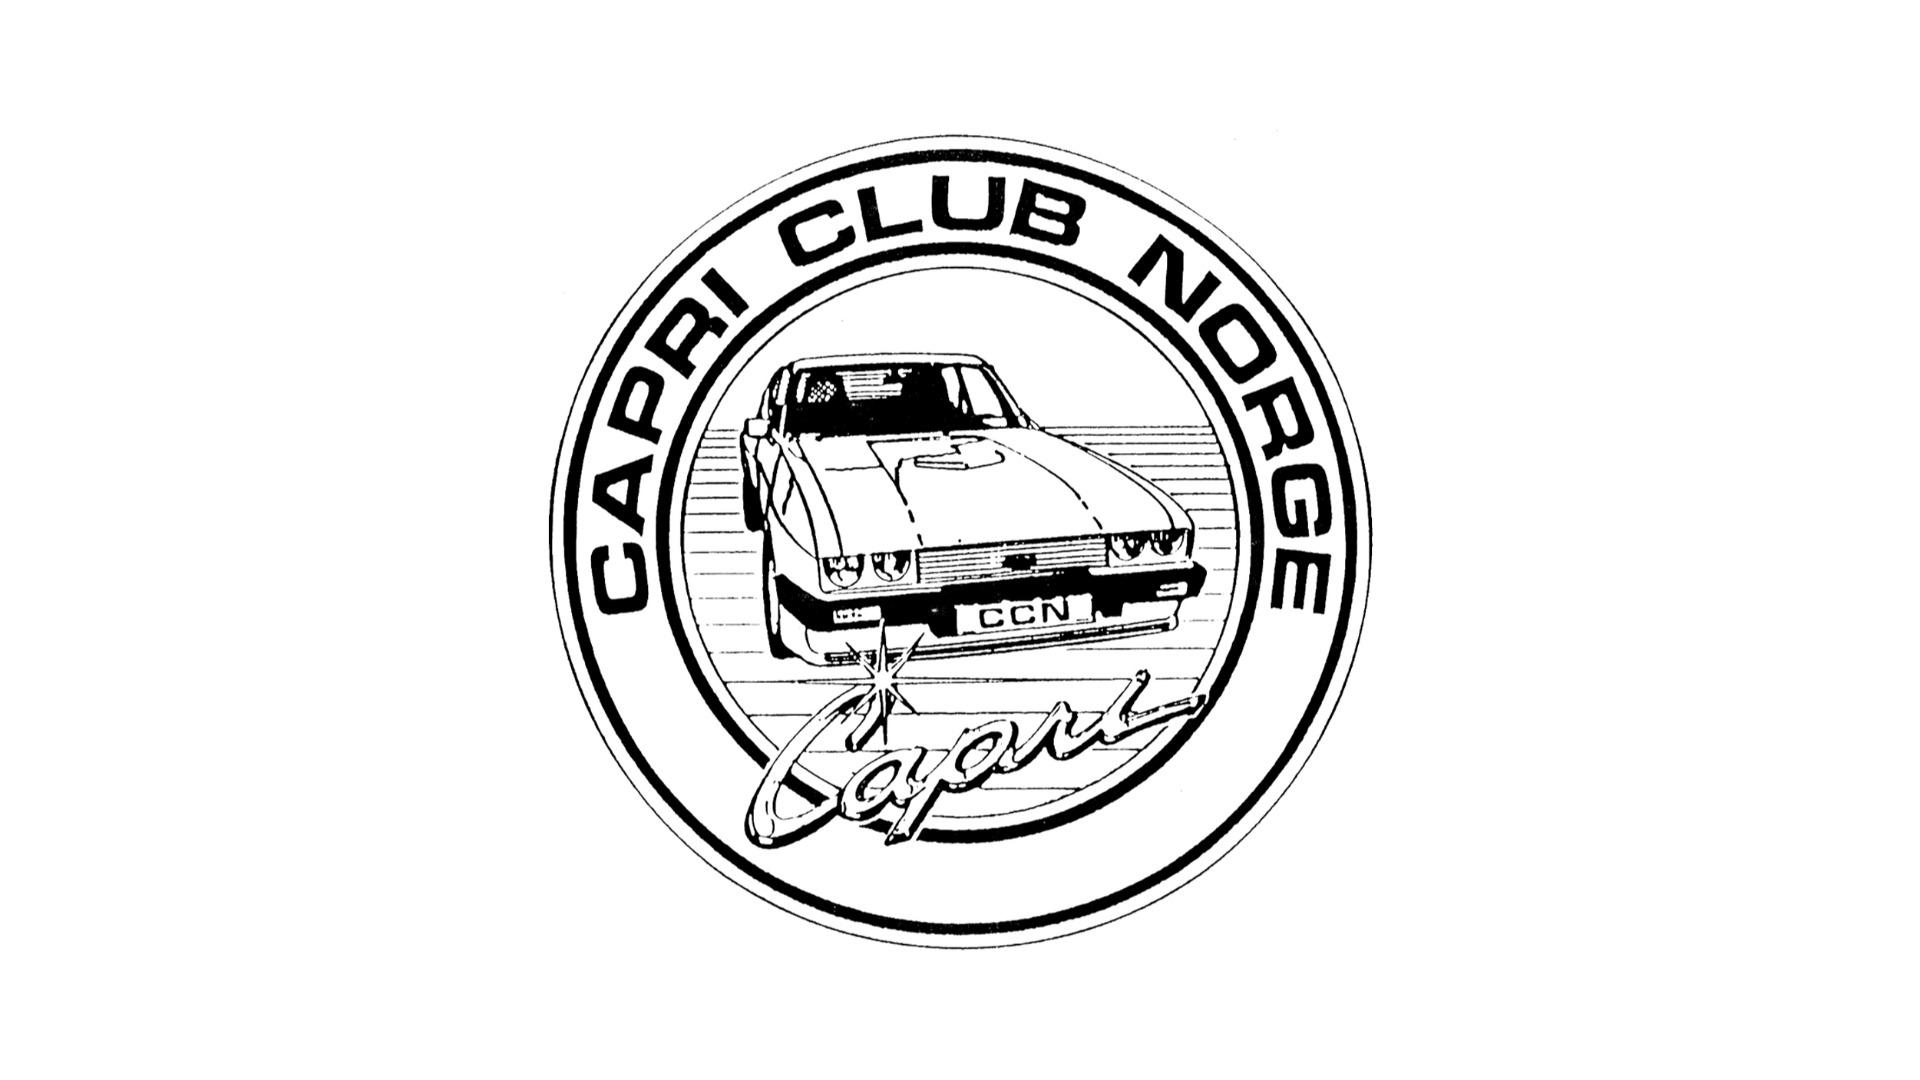 Capri+club+norge-Fullskjerm.jpg